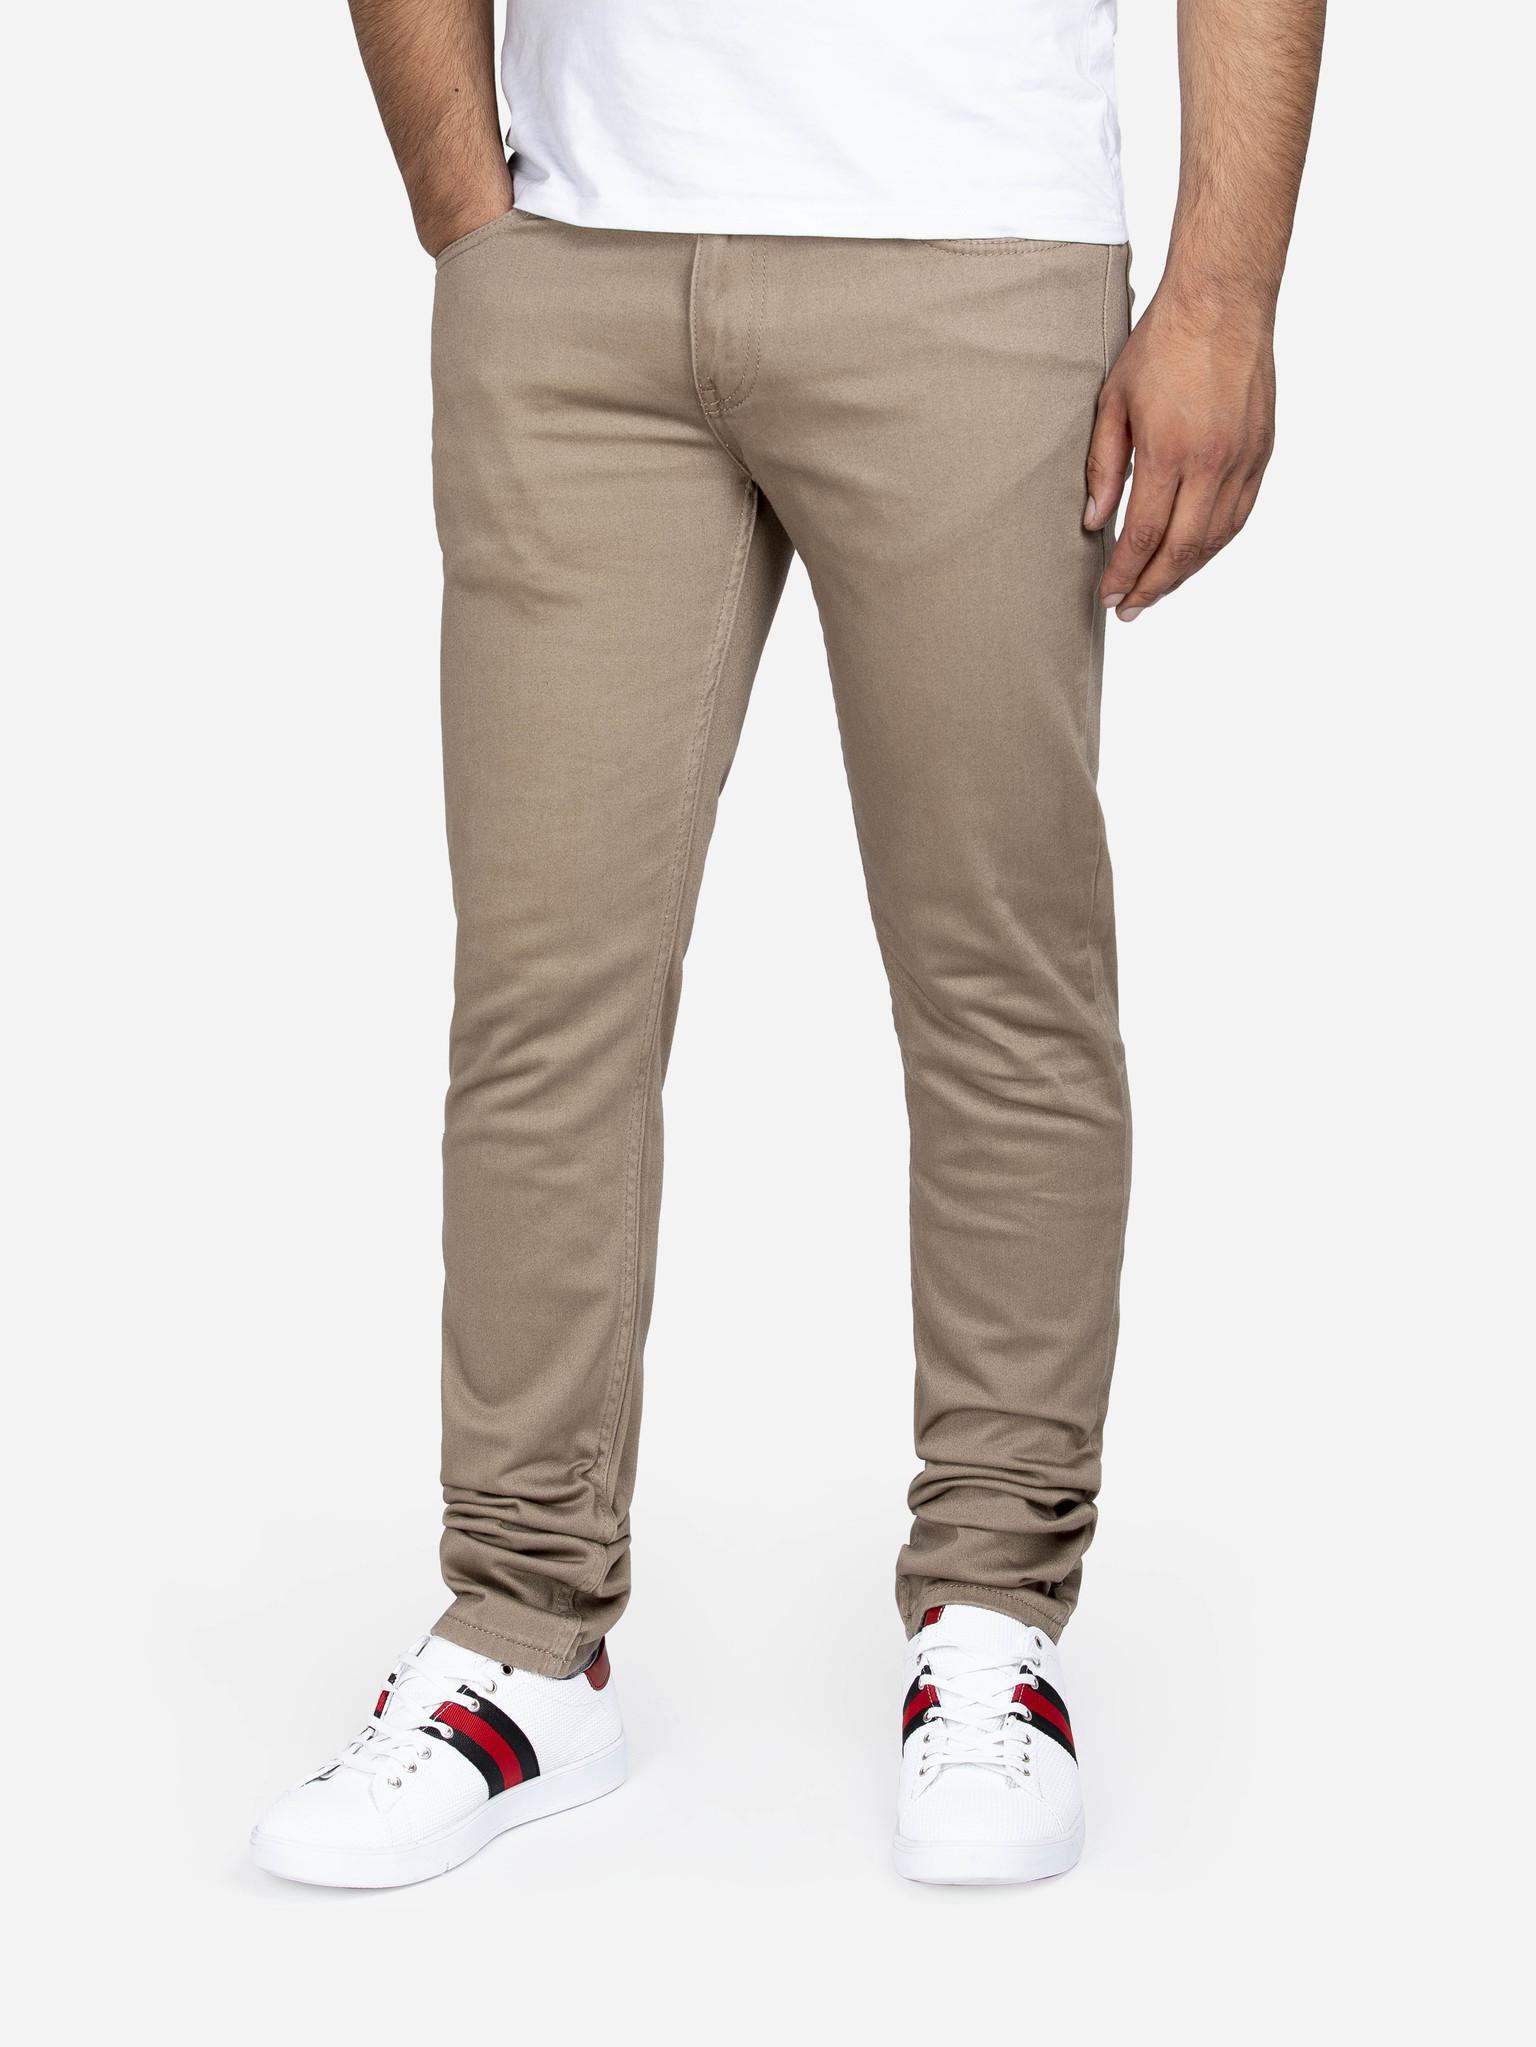 Gaznawi Jeans 68061 Brown L34 Maat: 40/34